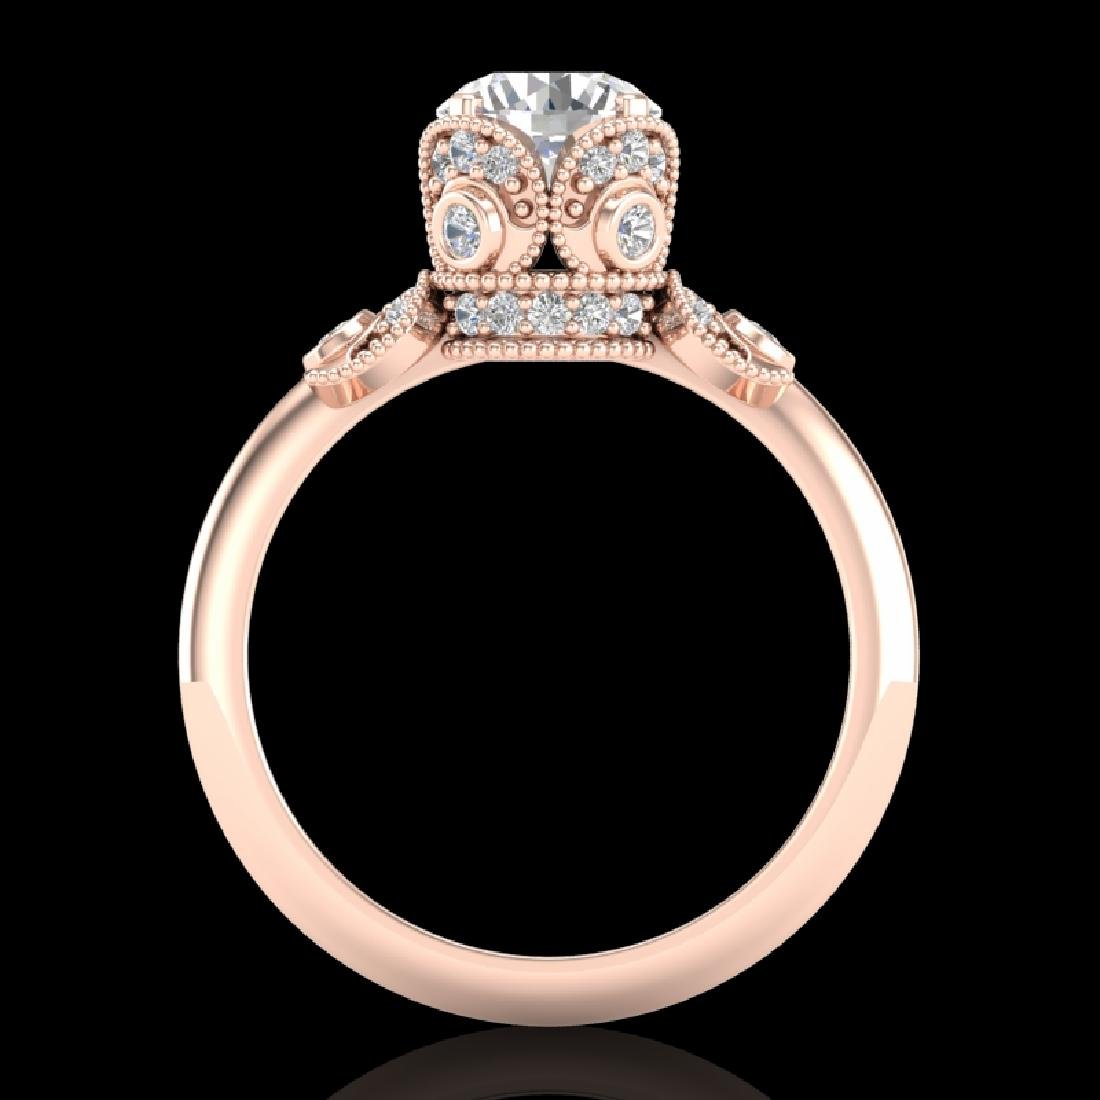 1.75 CTW VS/SI Diamond Solitaire Art Deco Ring 18K Rose - 2